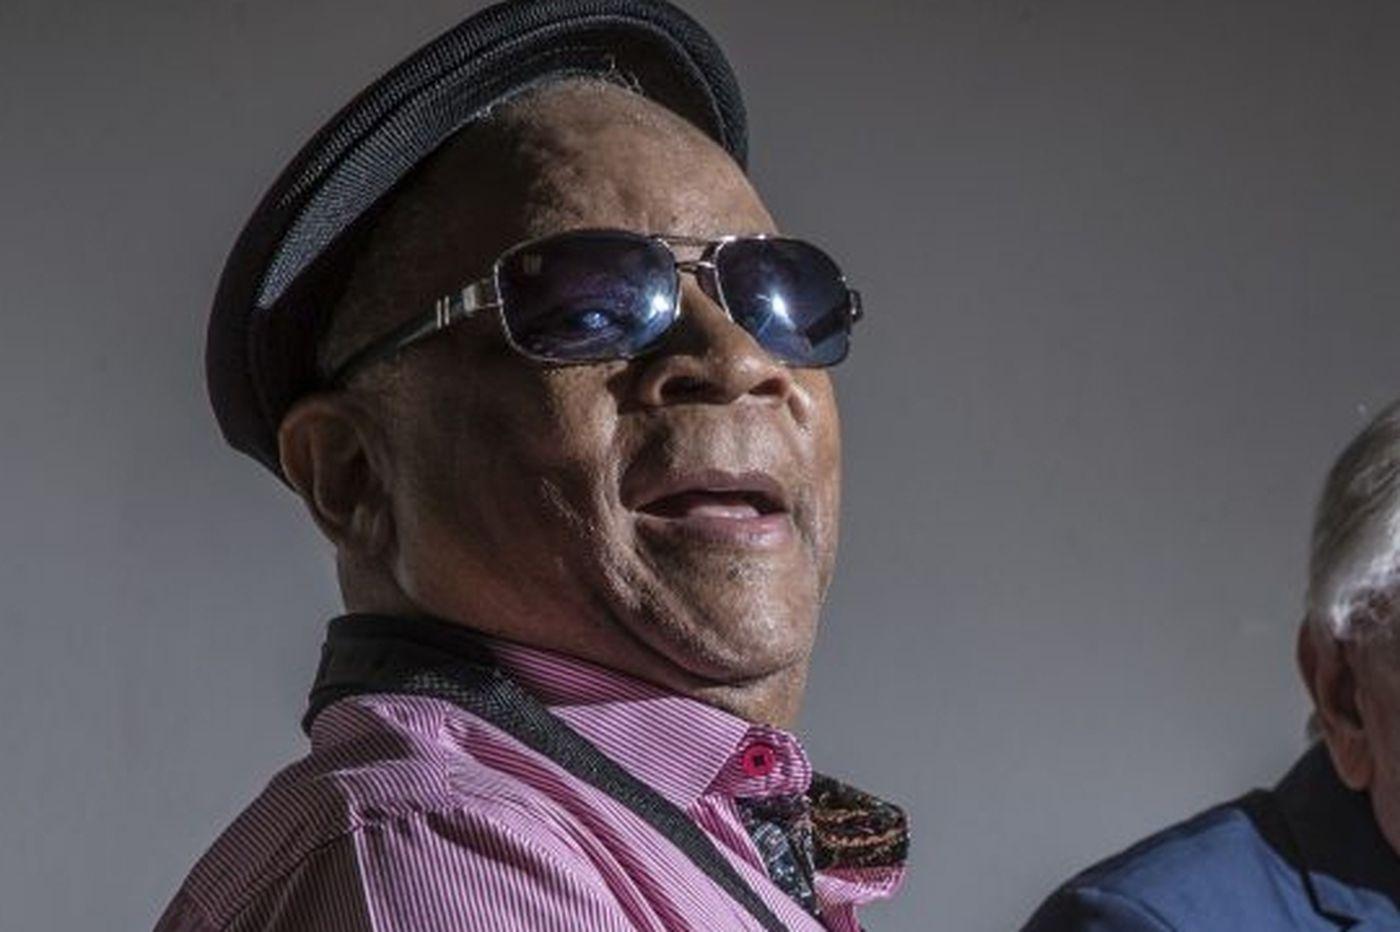 Bootsie Barnes, Philadelphia tenor sax great, has died of coronavirus at 82